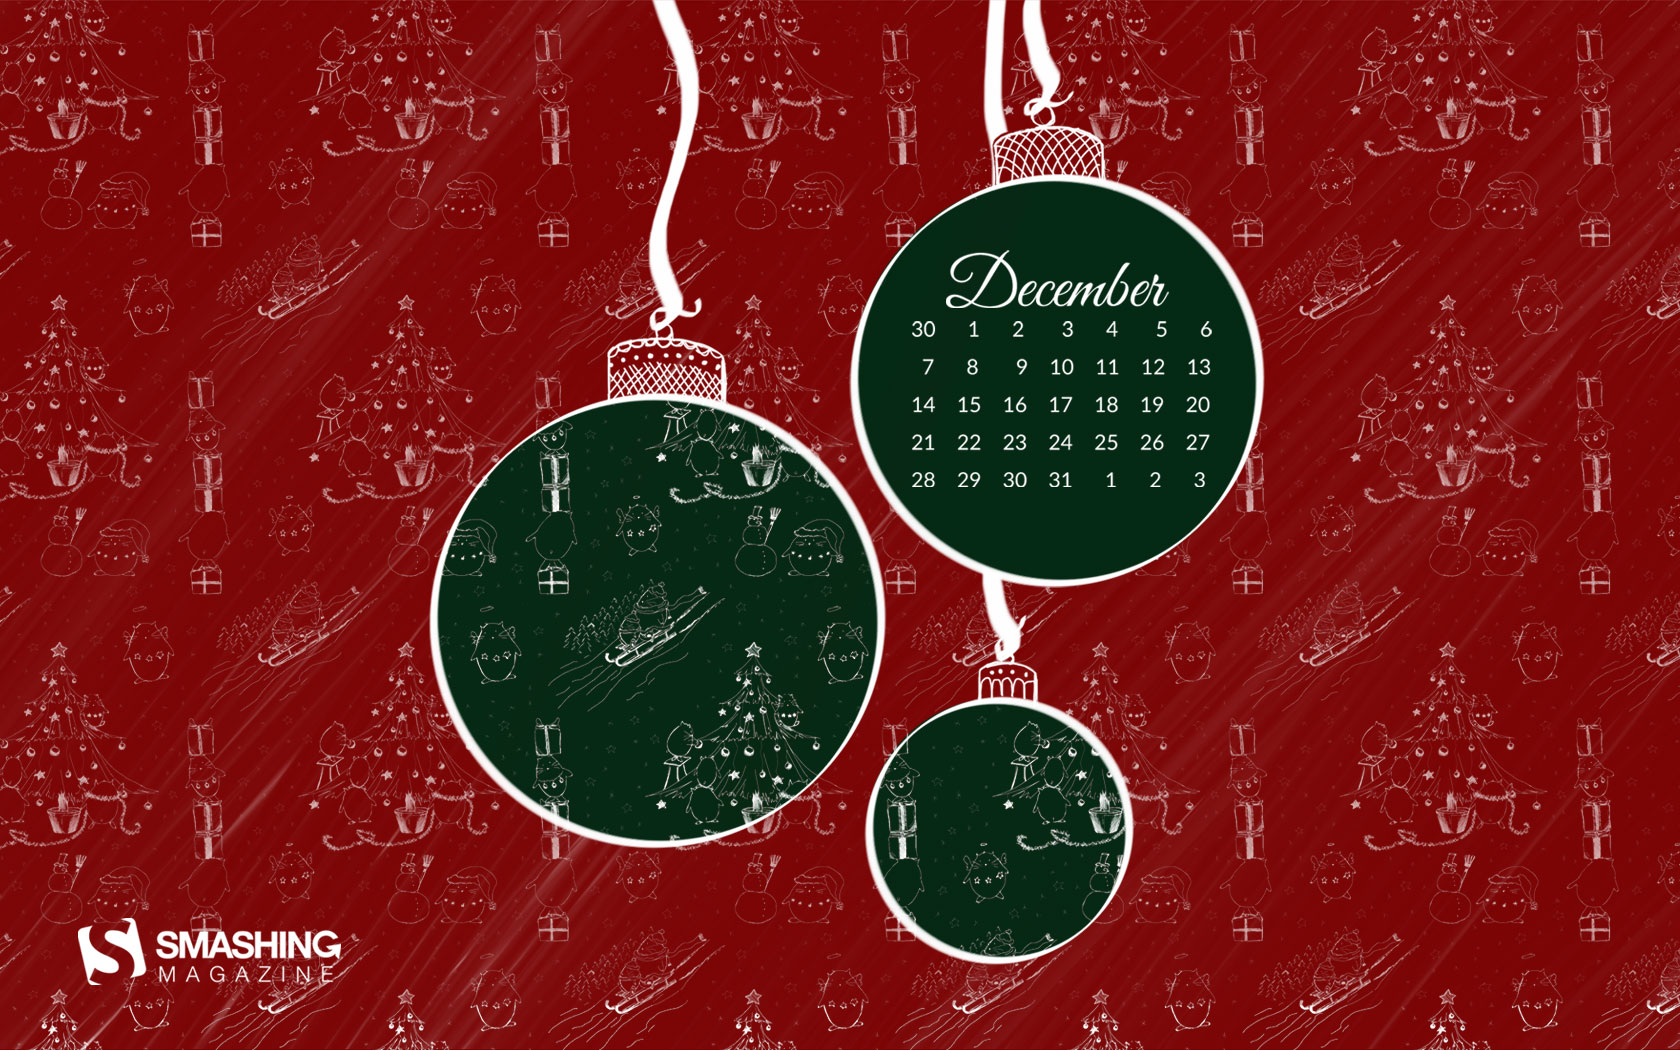 desktop wallpaper calendars: december 2015 — smashing magazine